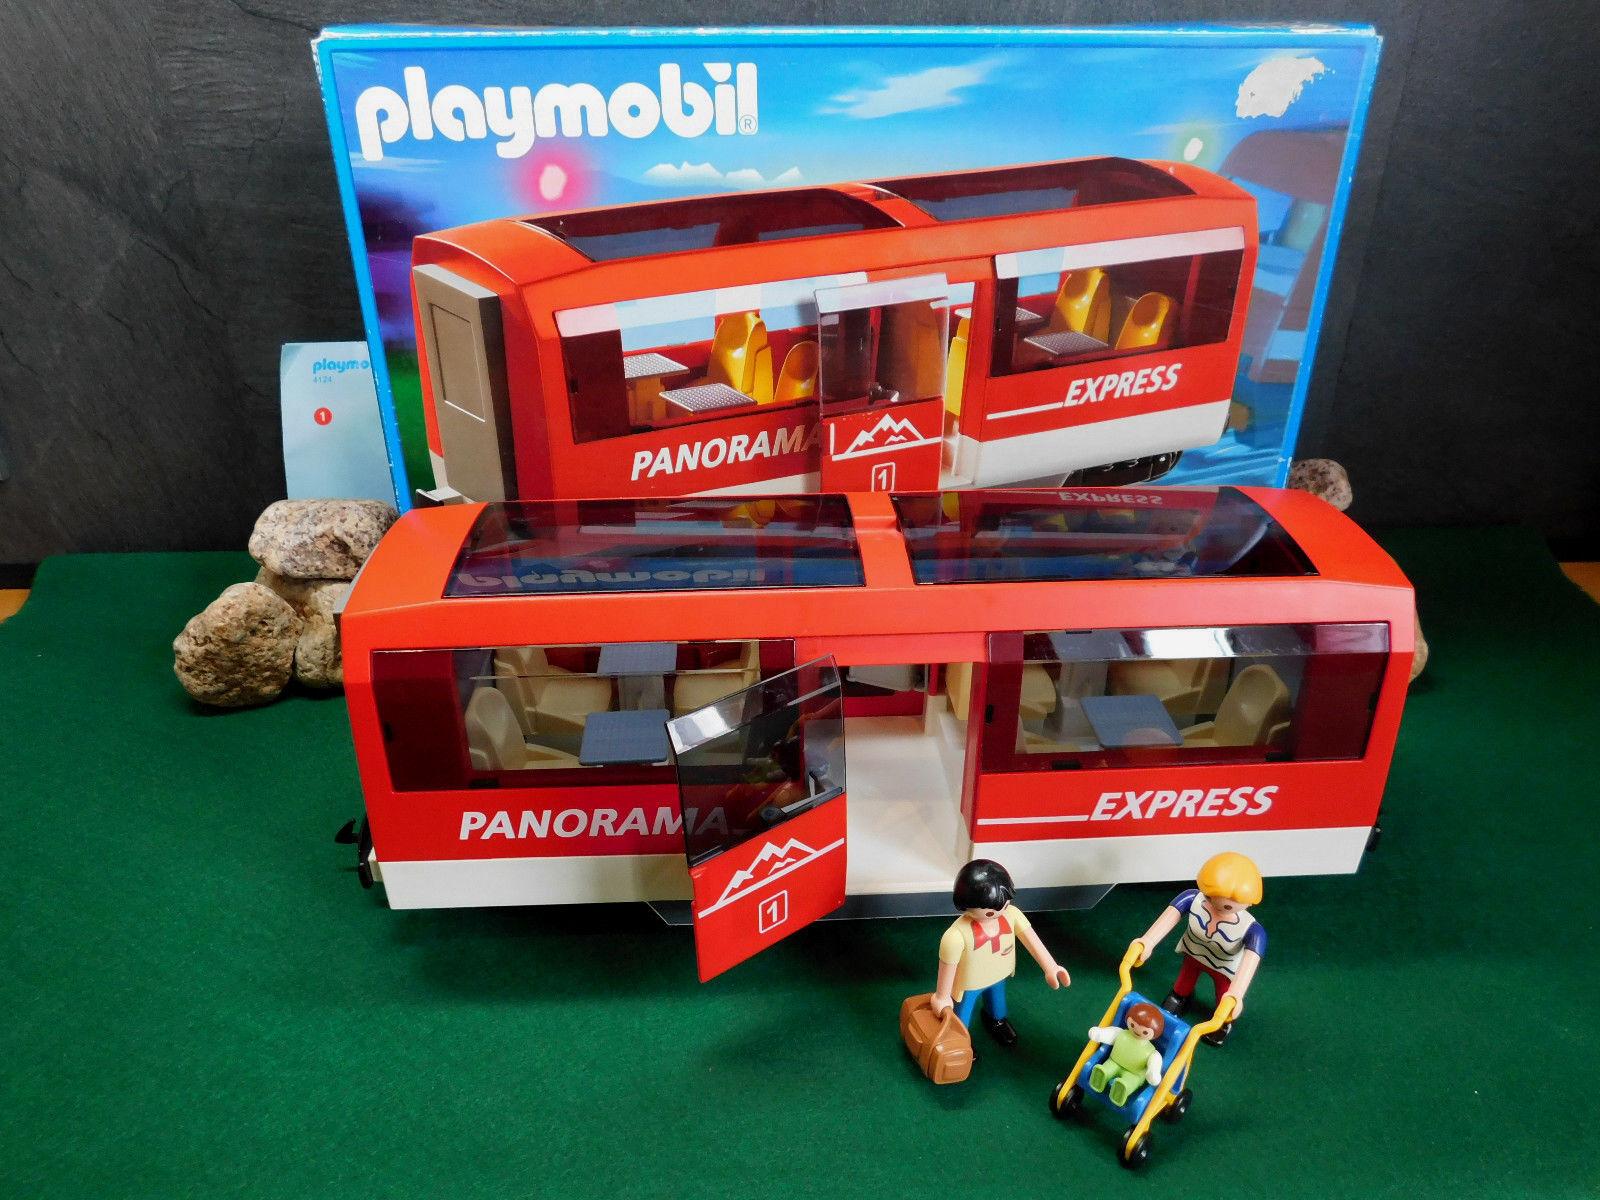 Playmobil Personenwagen Panorama-Express 4124-A/2005 mit Orig.-BA und OVP